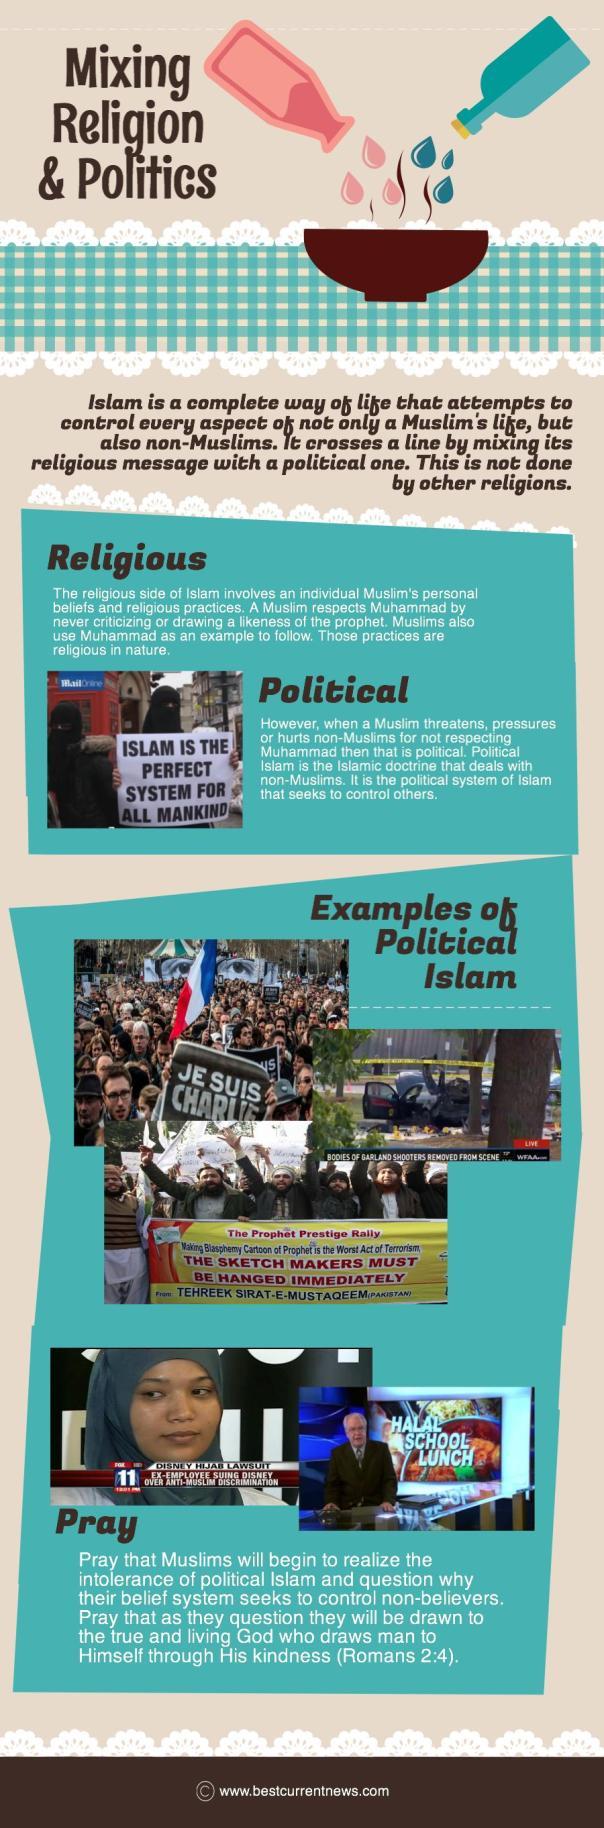 BCN Ramadan 2015 Day 14 Mixing Religion and Politics